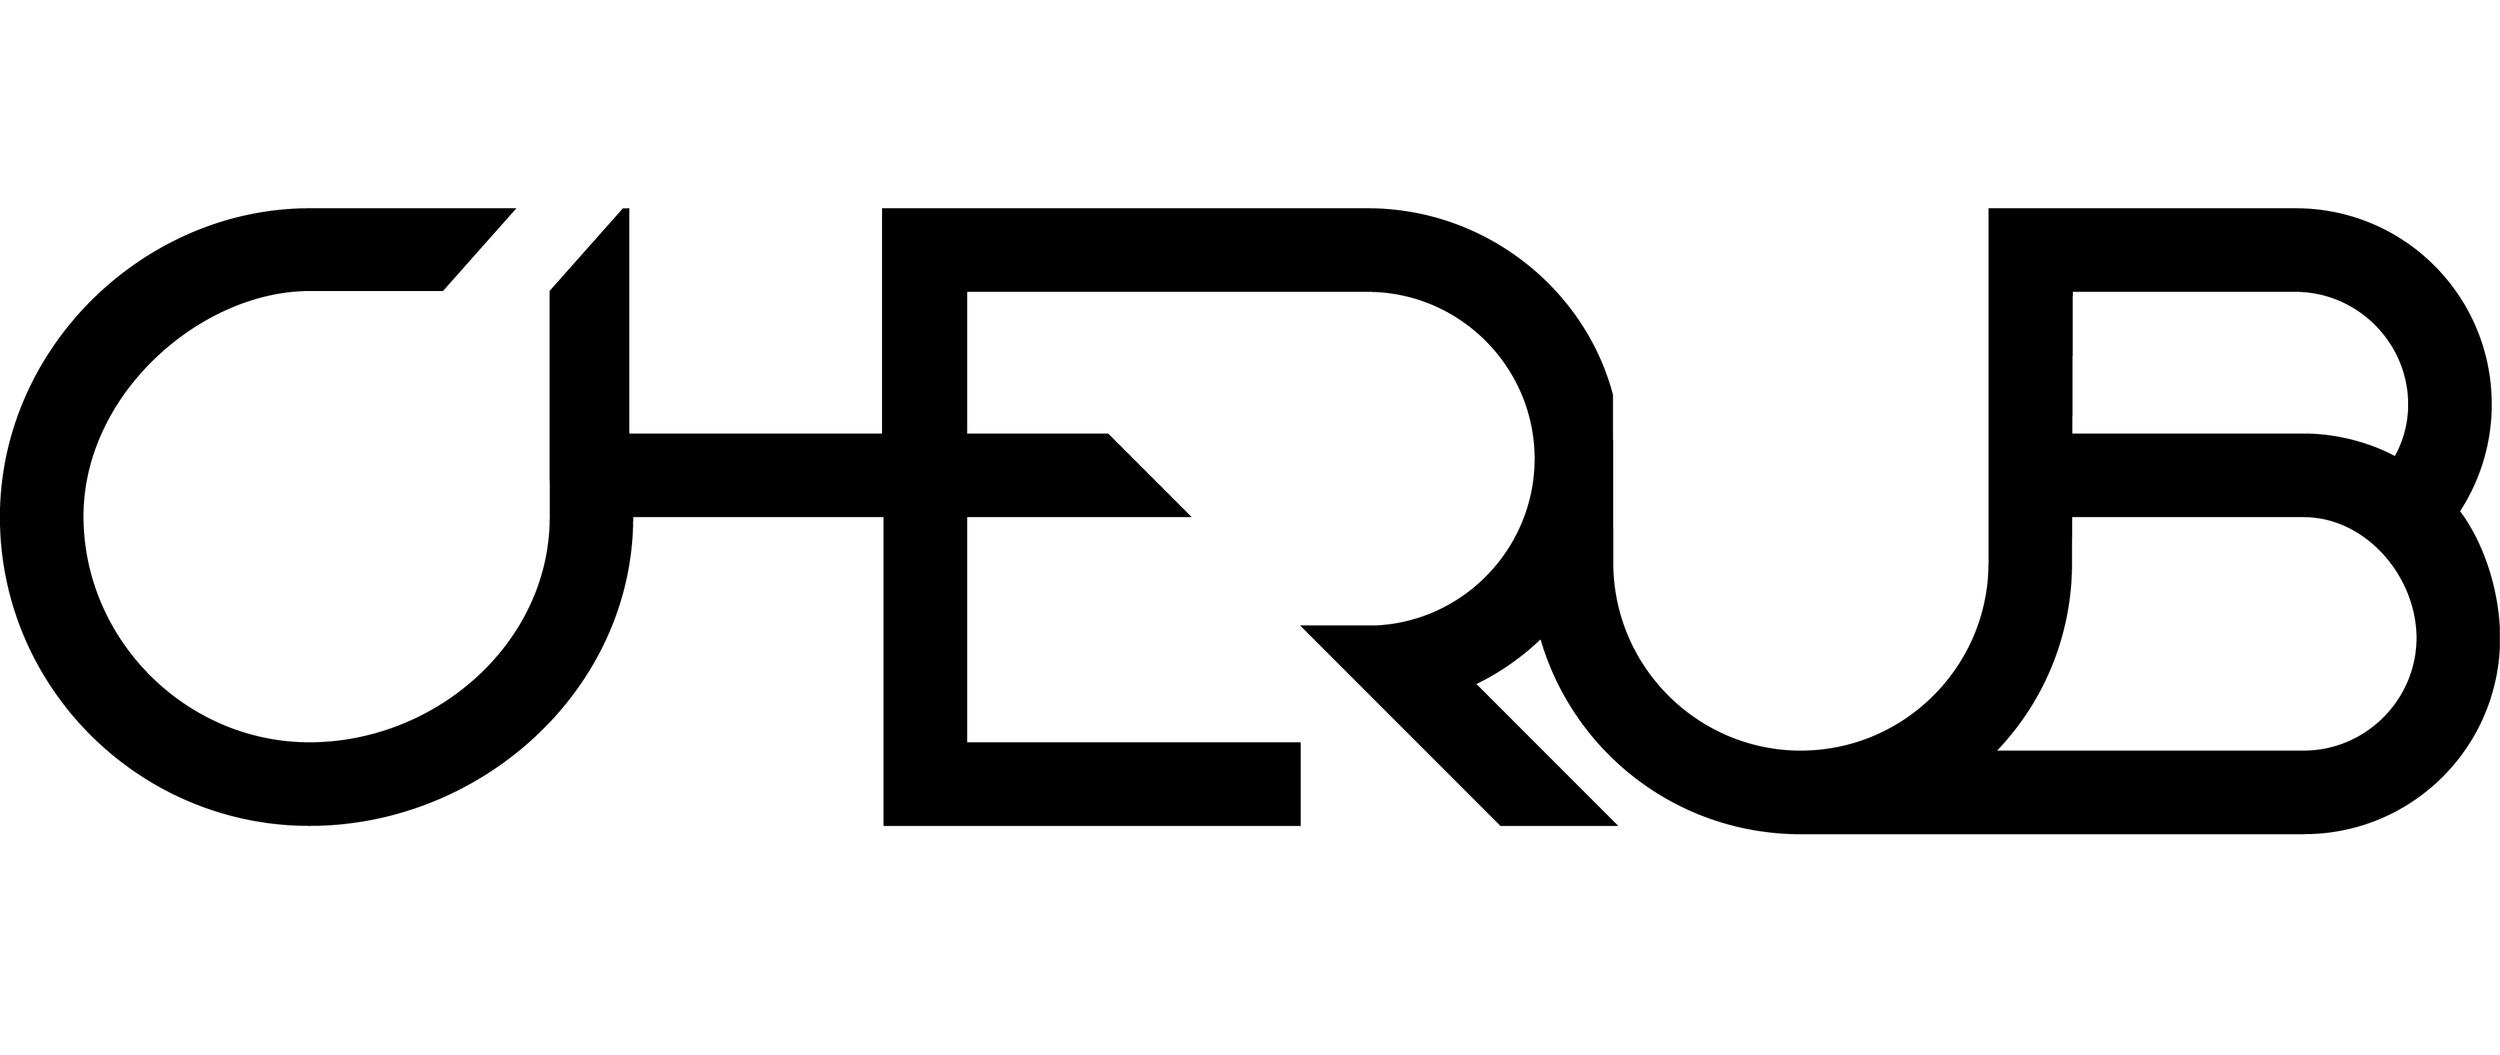 CHERUB_new_logo.jpg